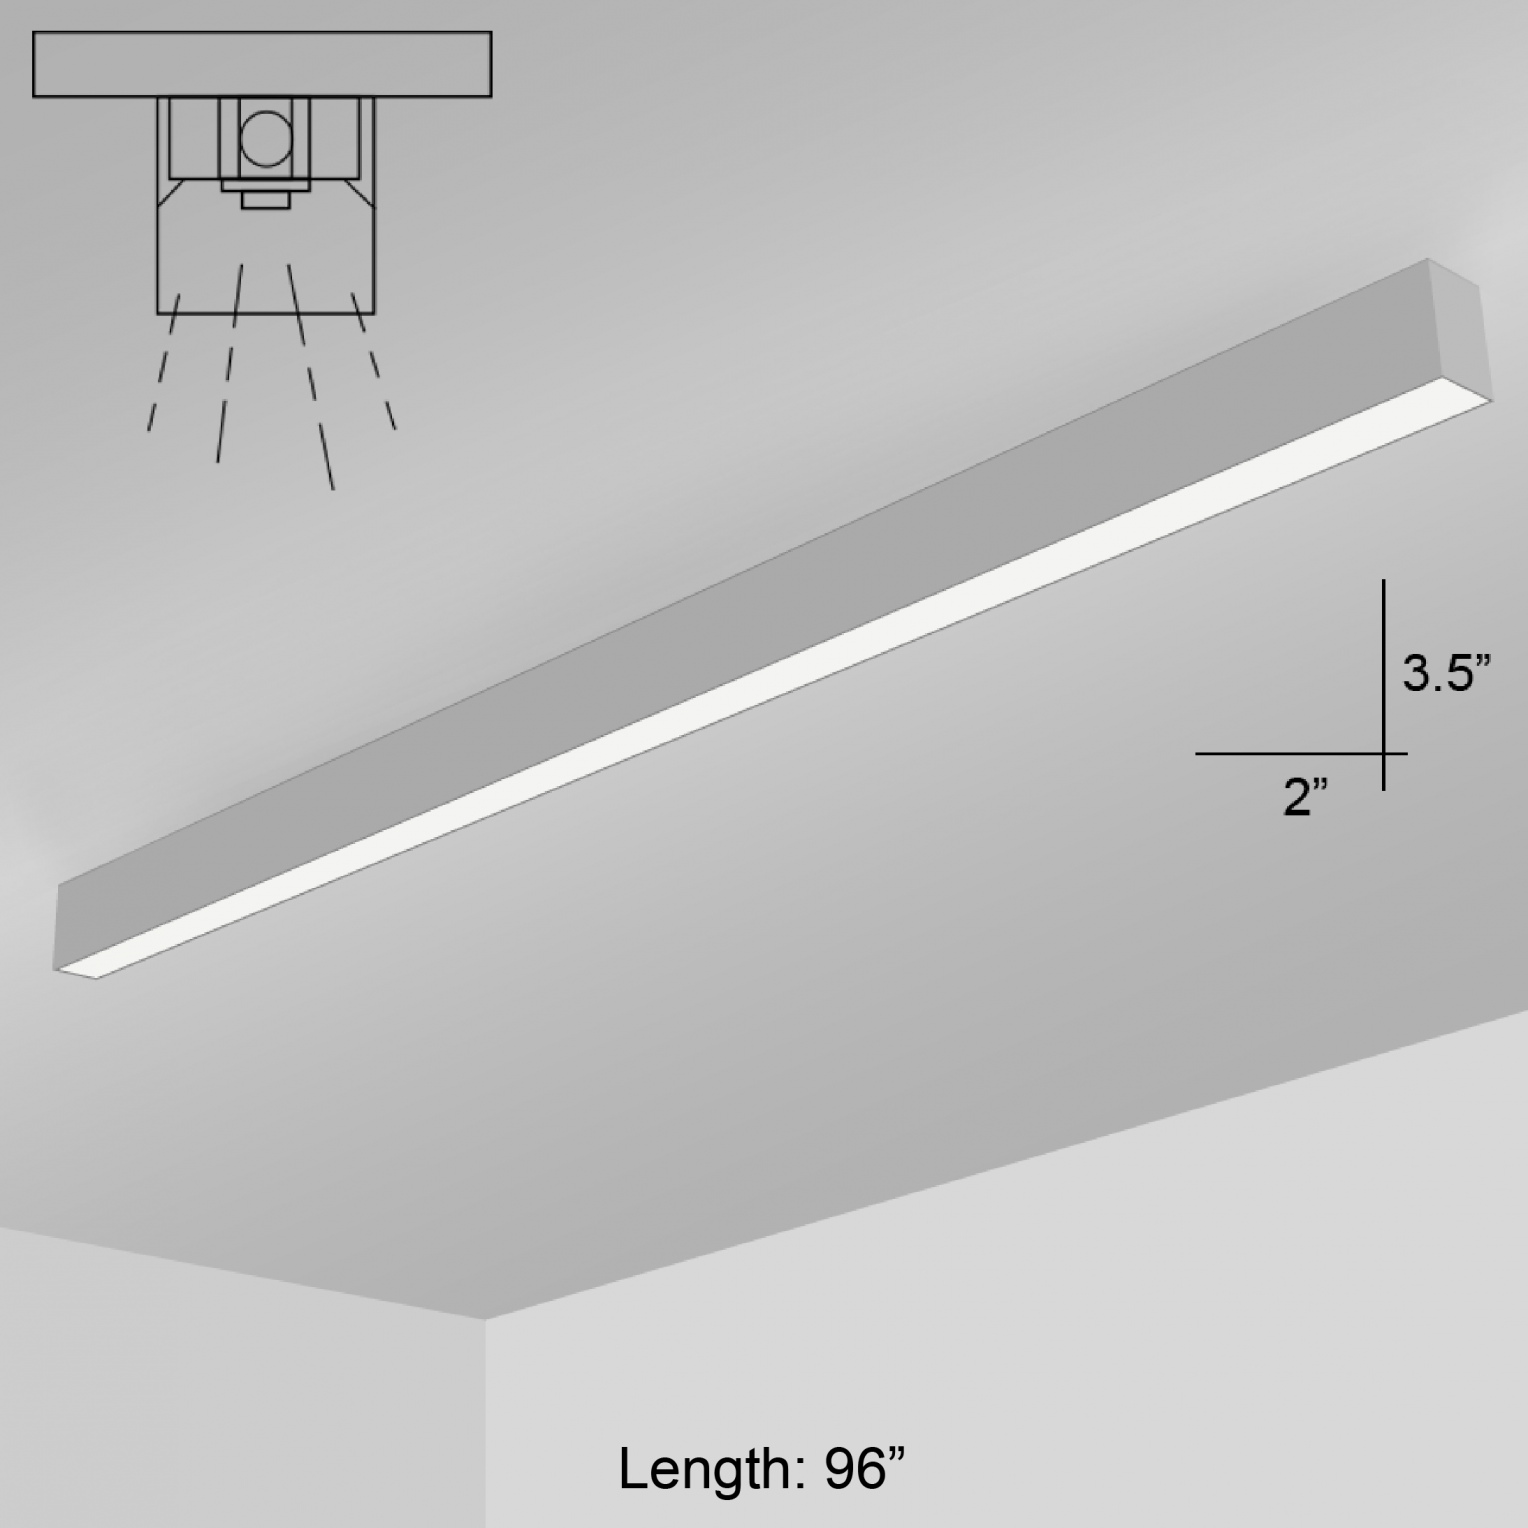 Alcon lighting 11137 8 s i253 series architectural led 8 foot linear alcon lighting 11137 8 s i253 series architectural led 8 foot linear surface mount direct light fixture alconlighting arubaitofo Images